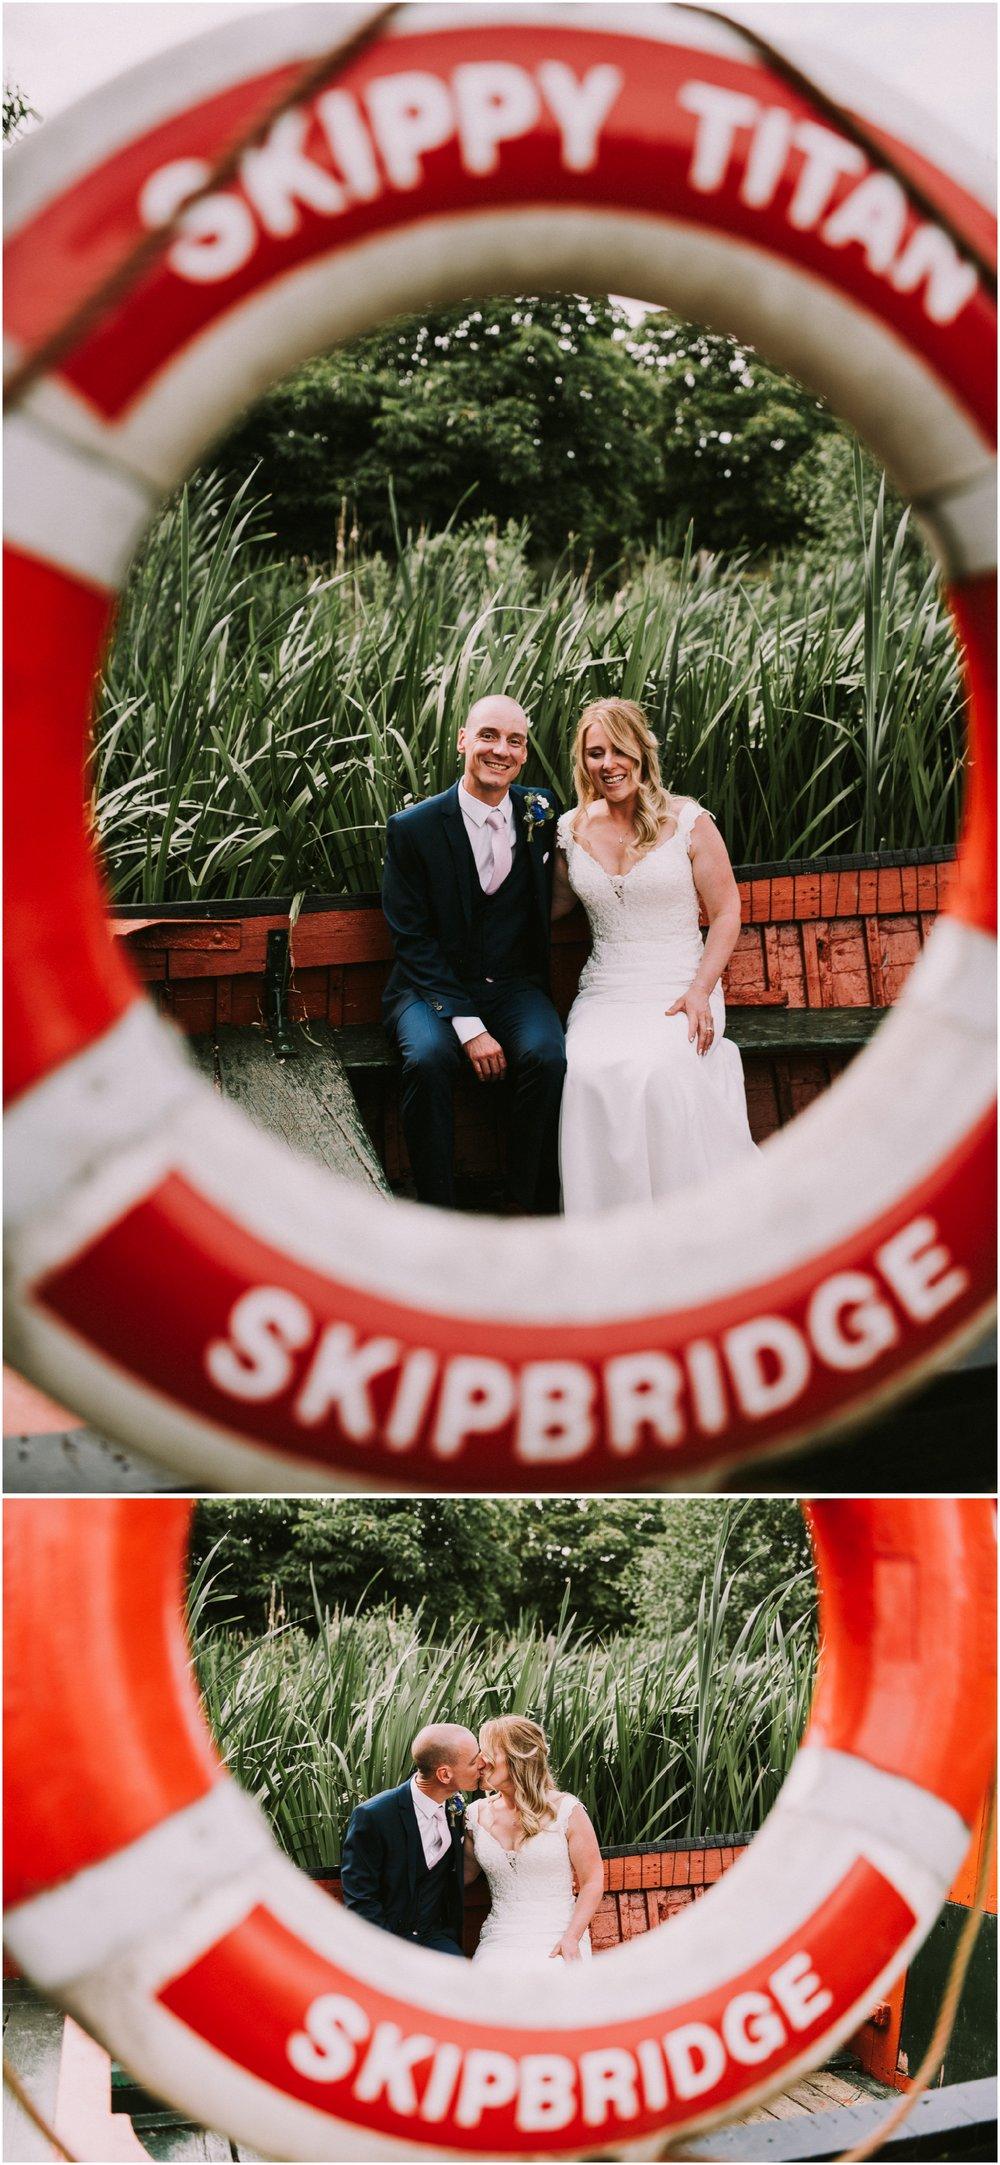 SkipbridegFarmWedding-LukeHolroyd-Yorkshirewedding_0116.jpg